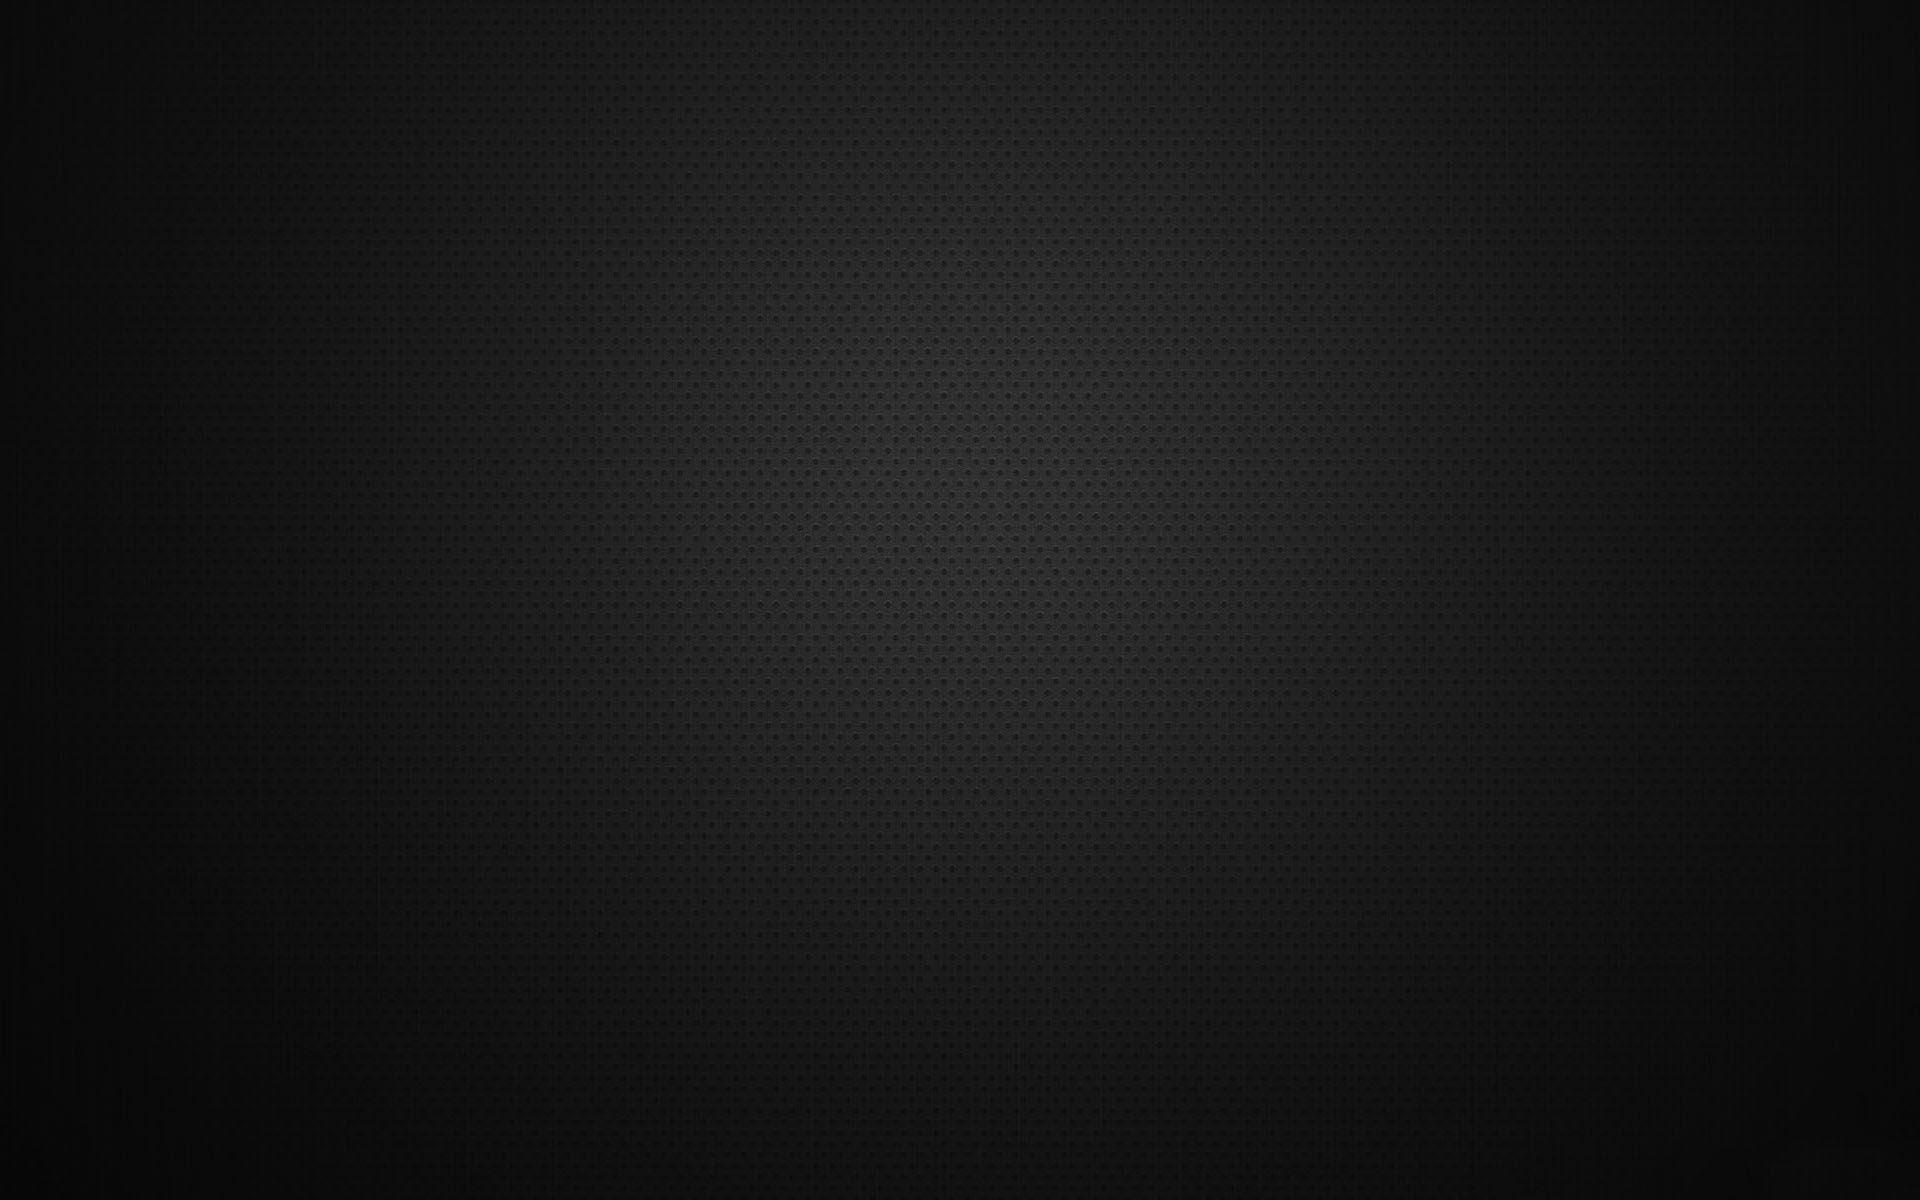 Cool Black Background Wallpaper 1920x1200